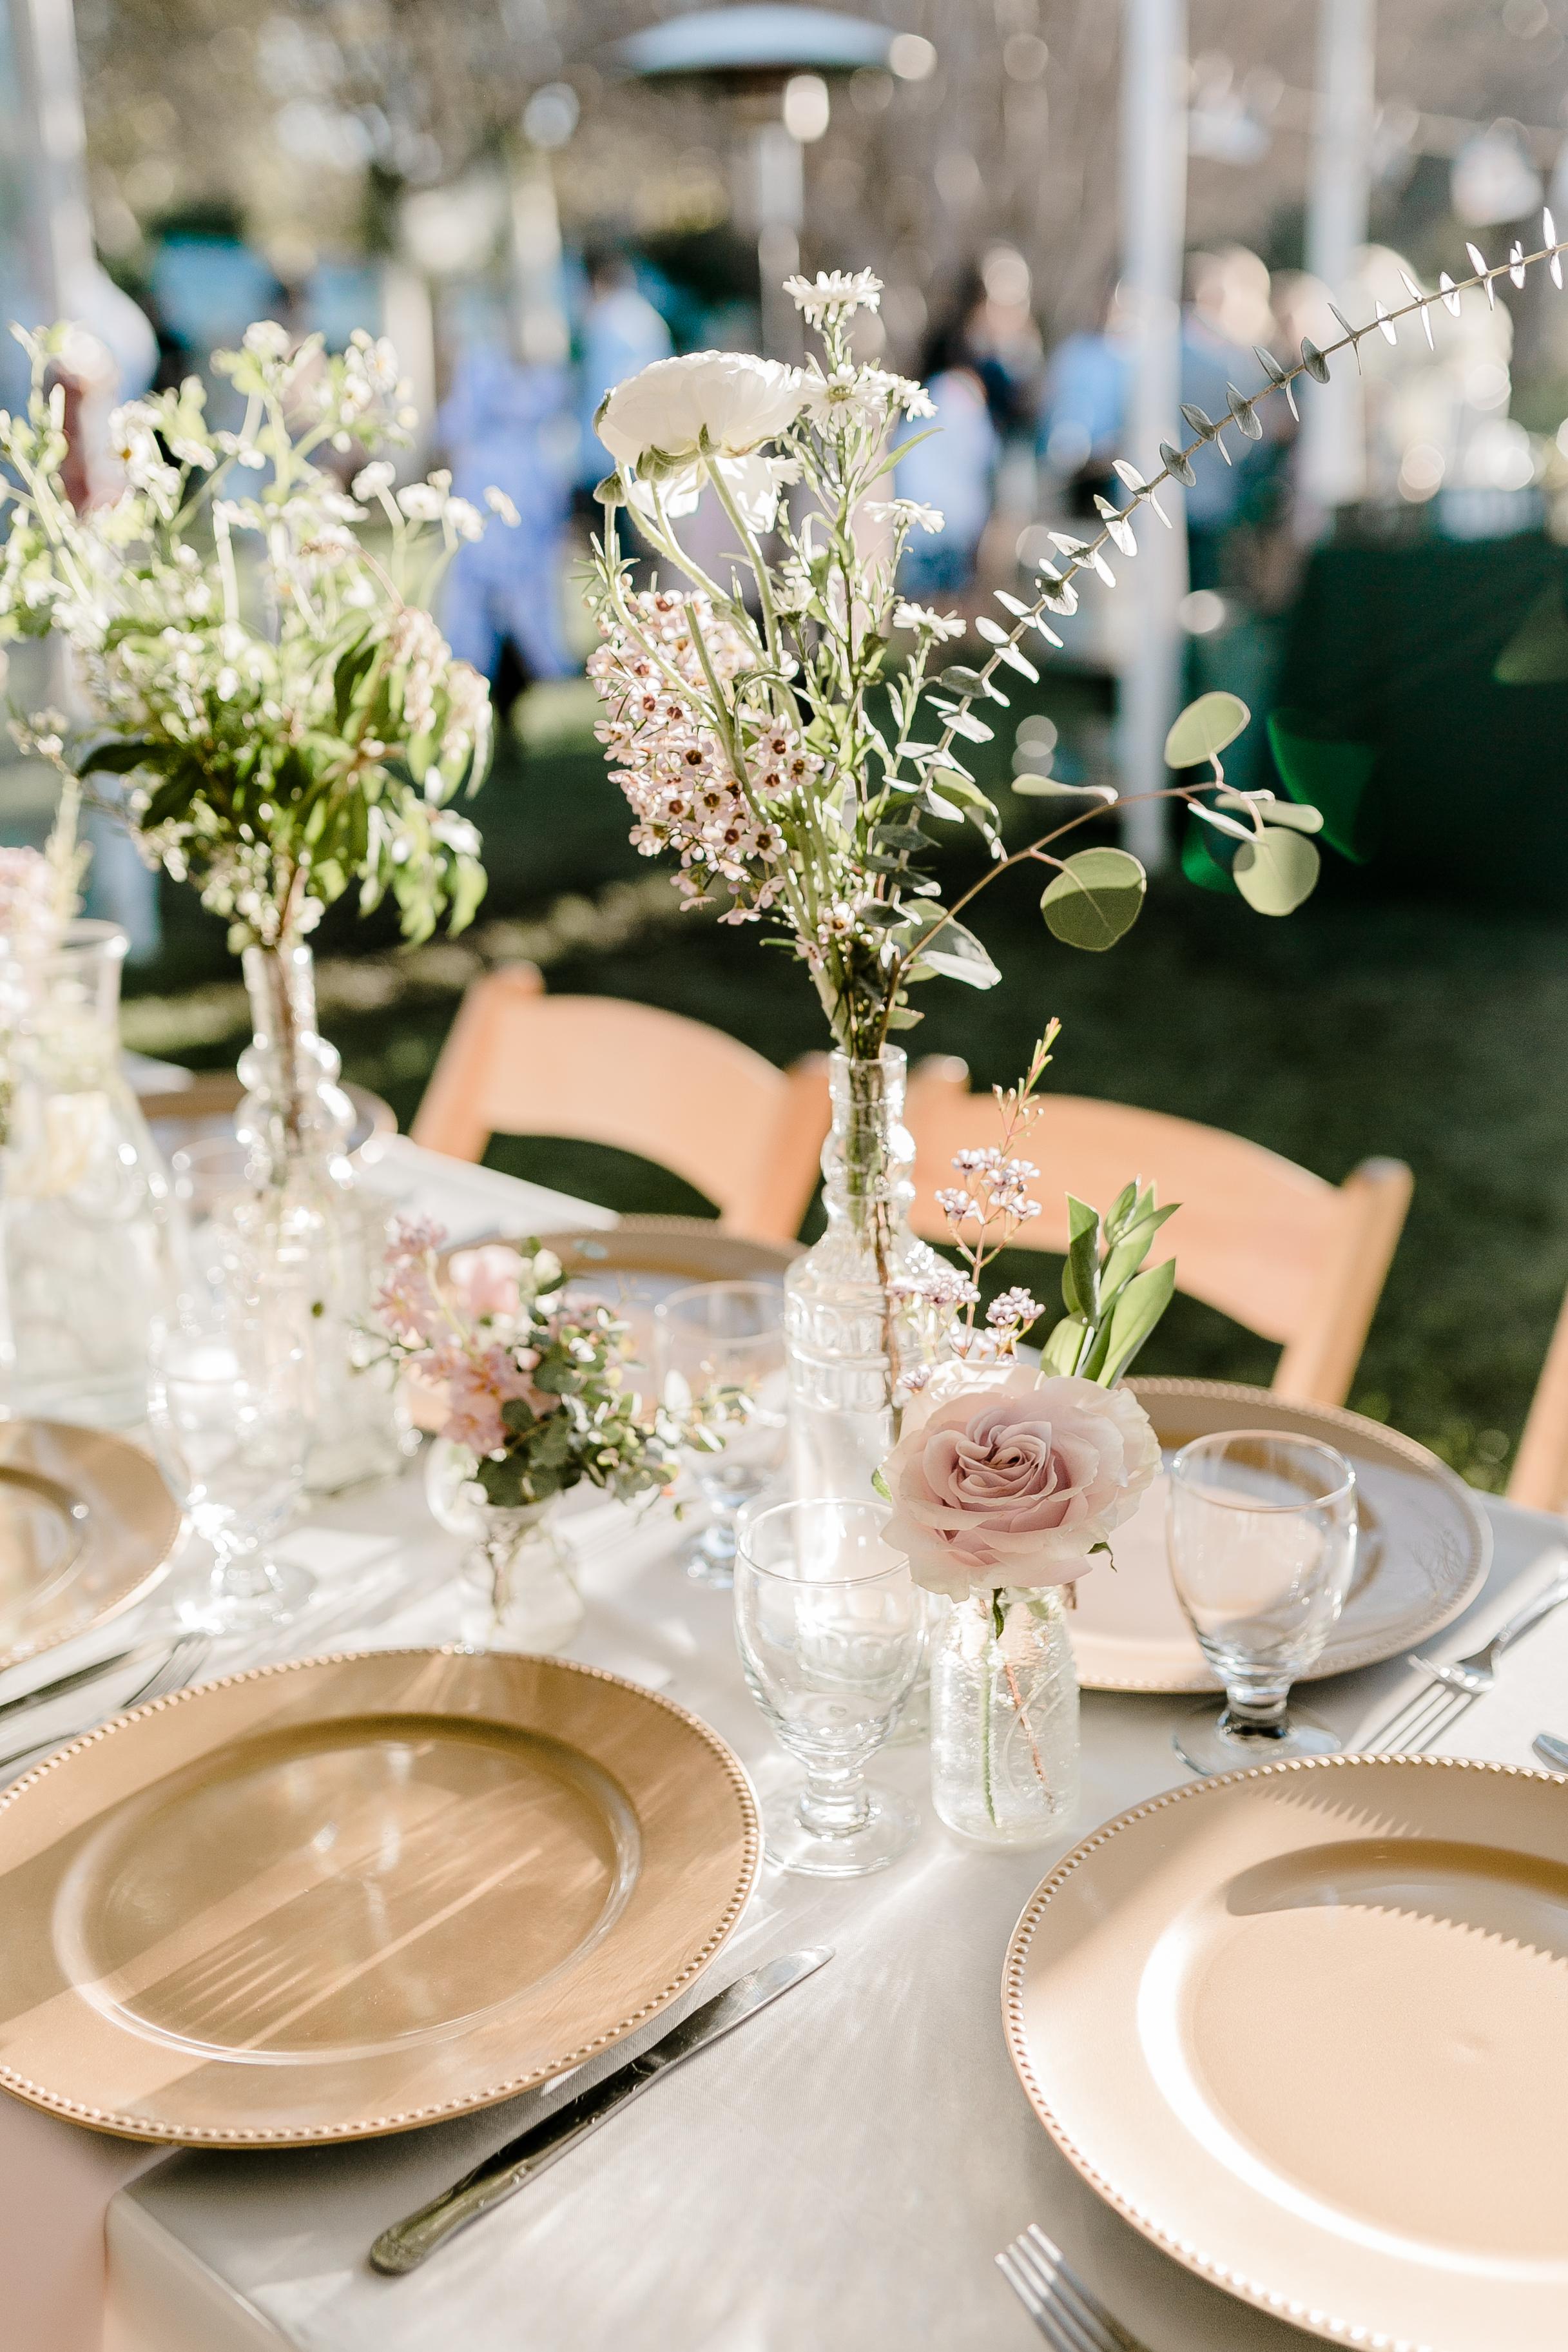 South-Coast-Botanic-Garden-Wedding-Planner63.jpg